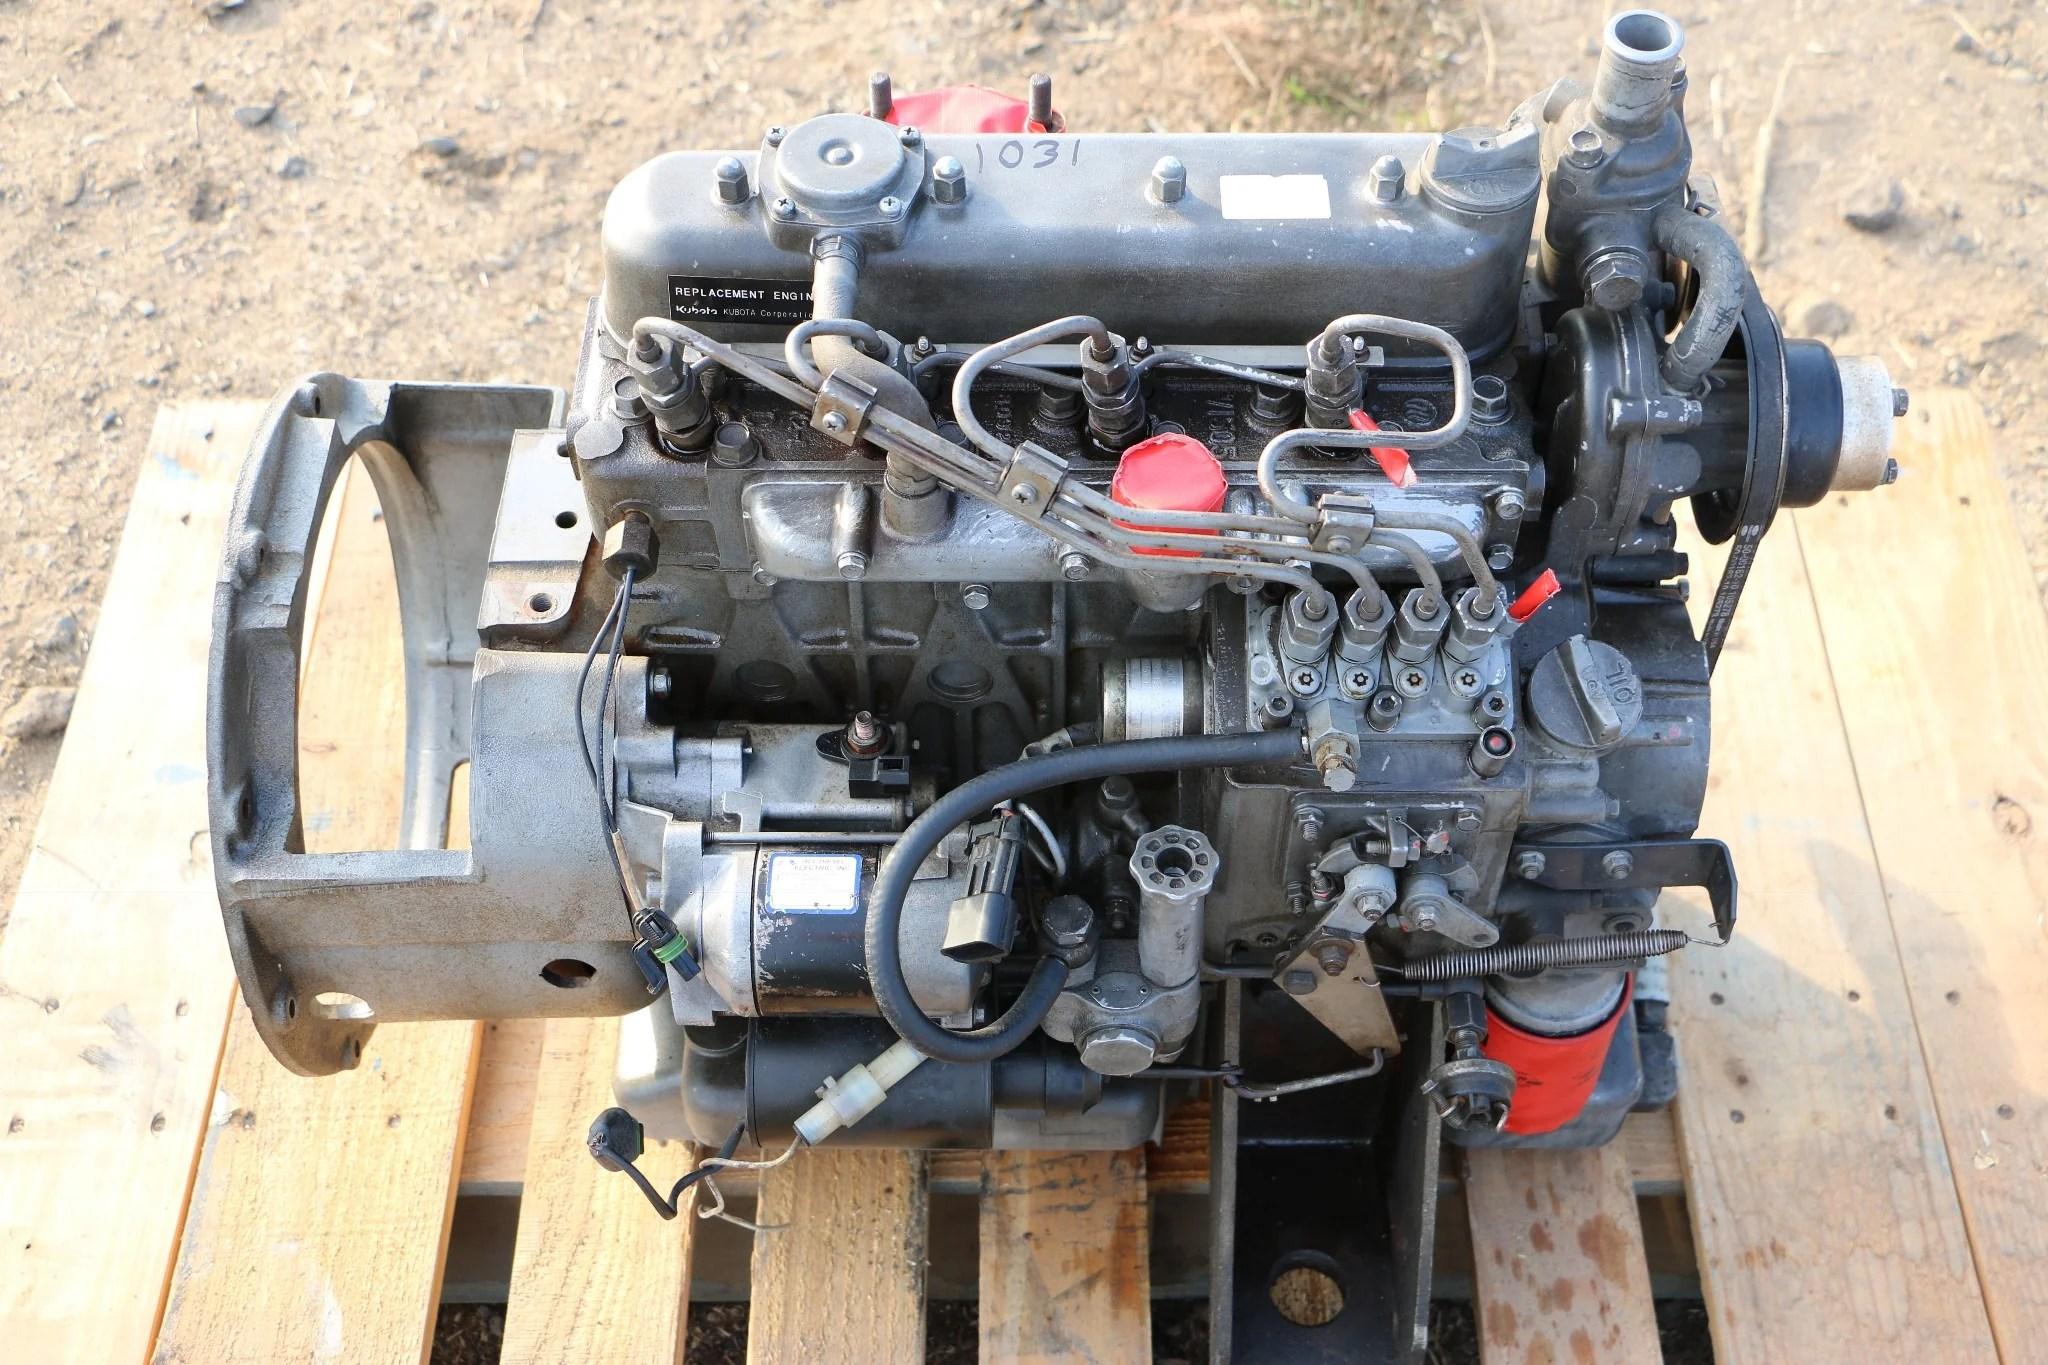 hight resolution of kubota v1505 diesel engine motor for bobcat pump generator etc 1031